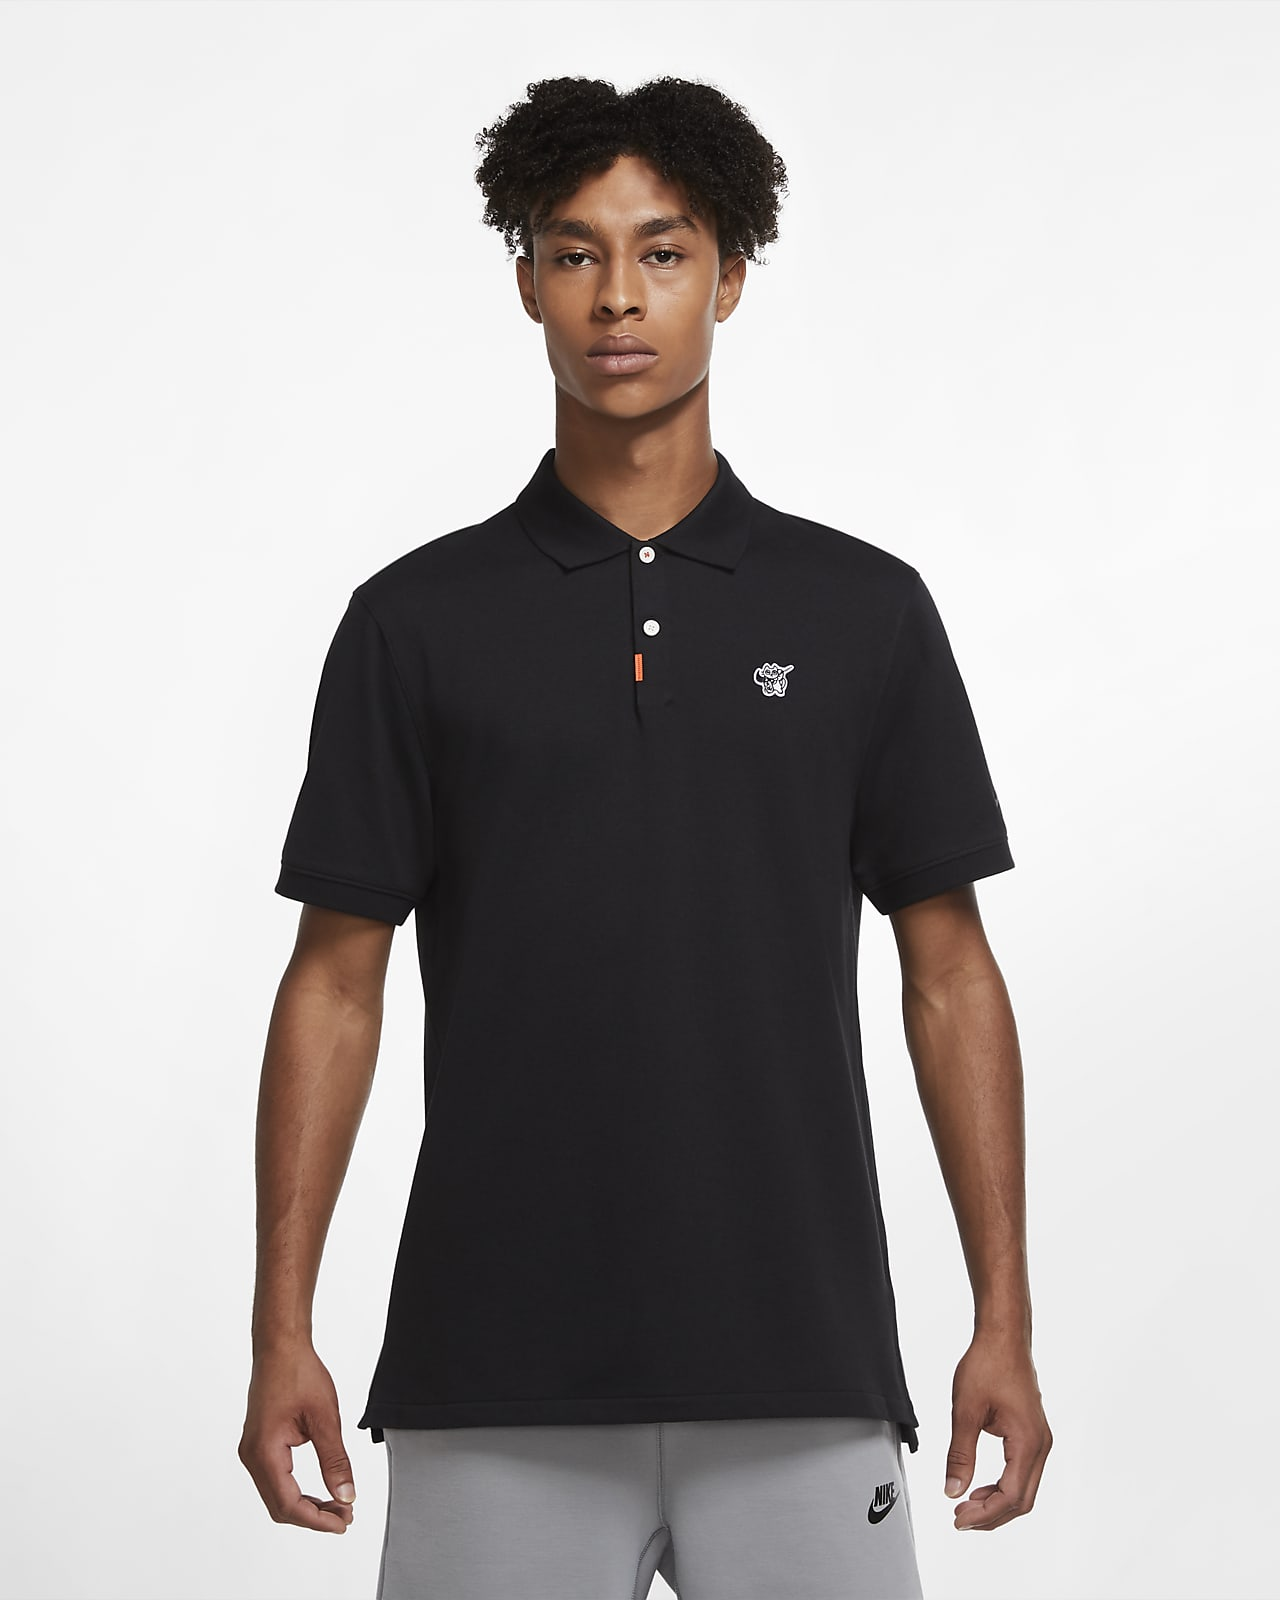 The Nike Polo Naomi Osaka Slim Fit Polo